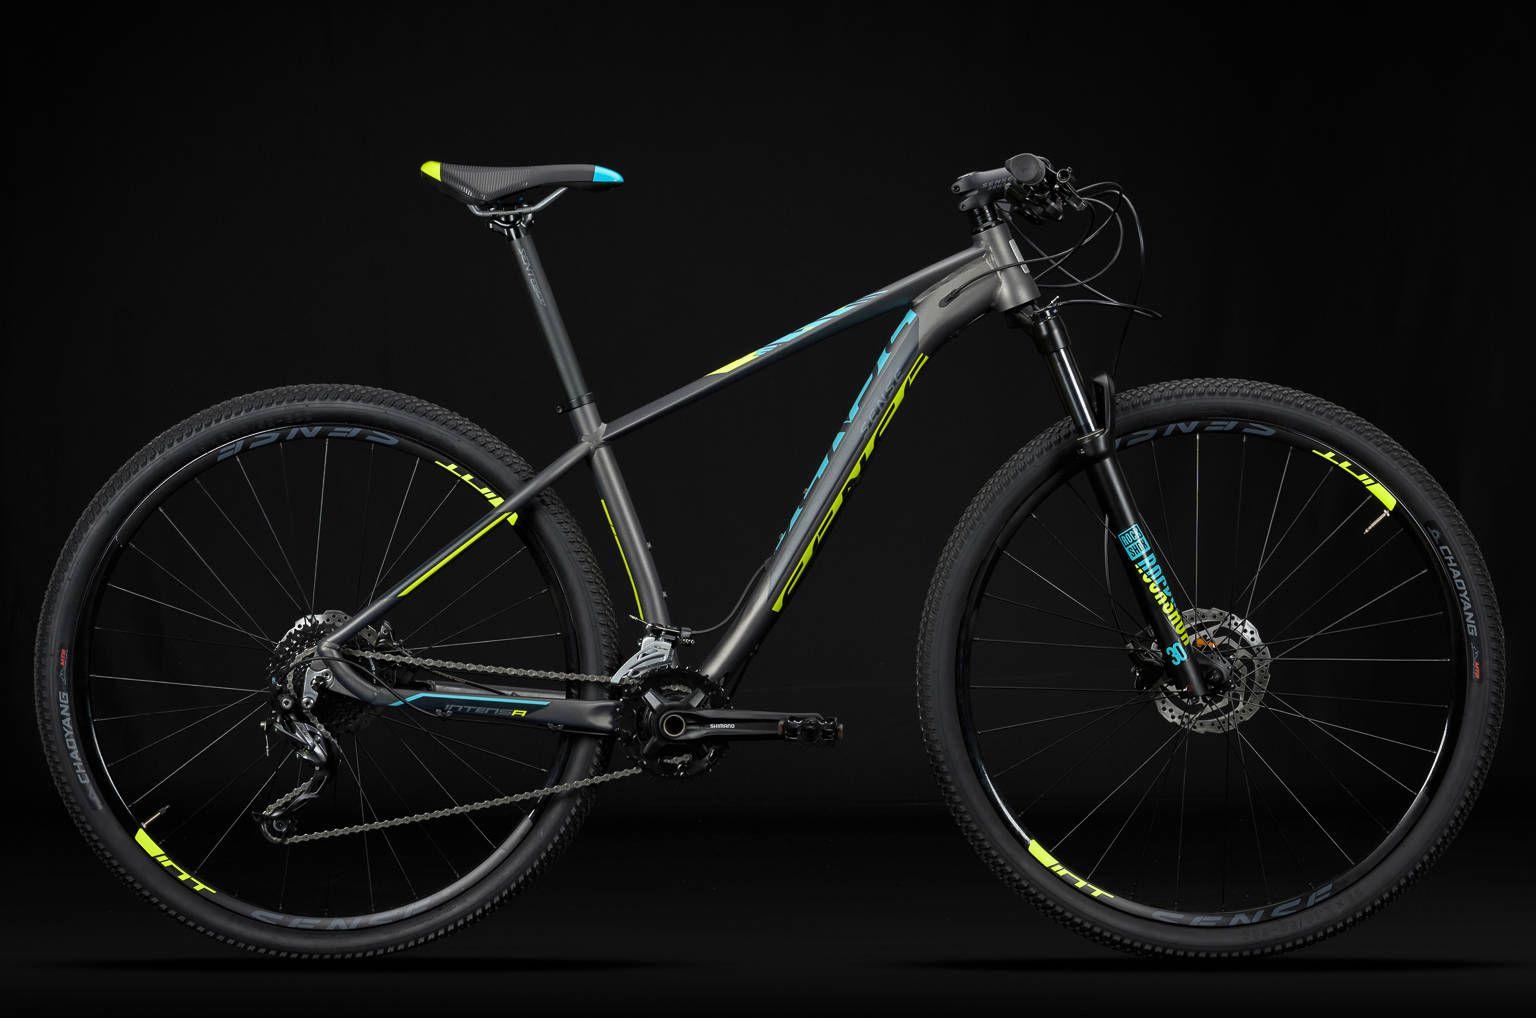 Bicicleta Sense - Intensa - 2020 - Preta